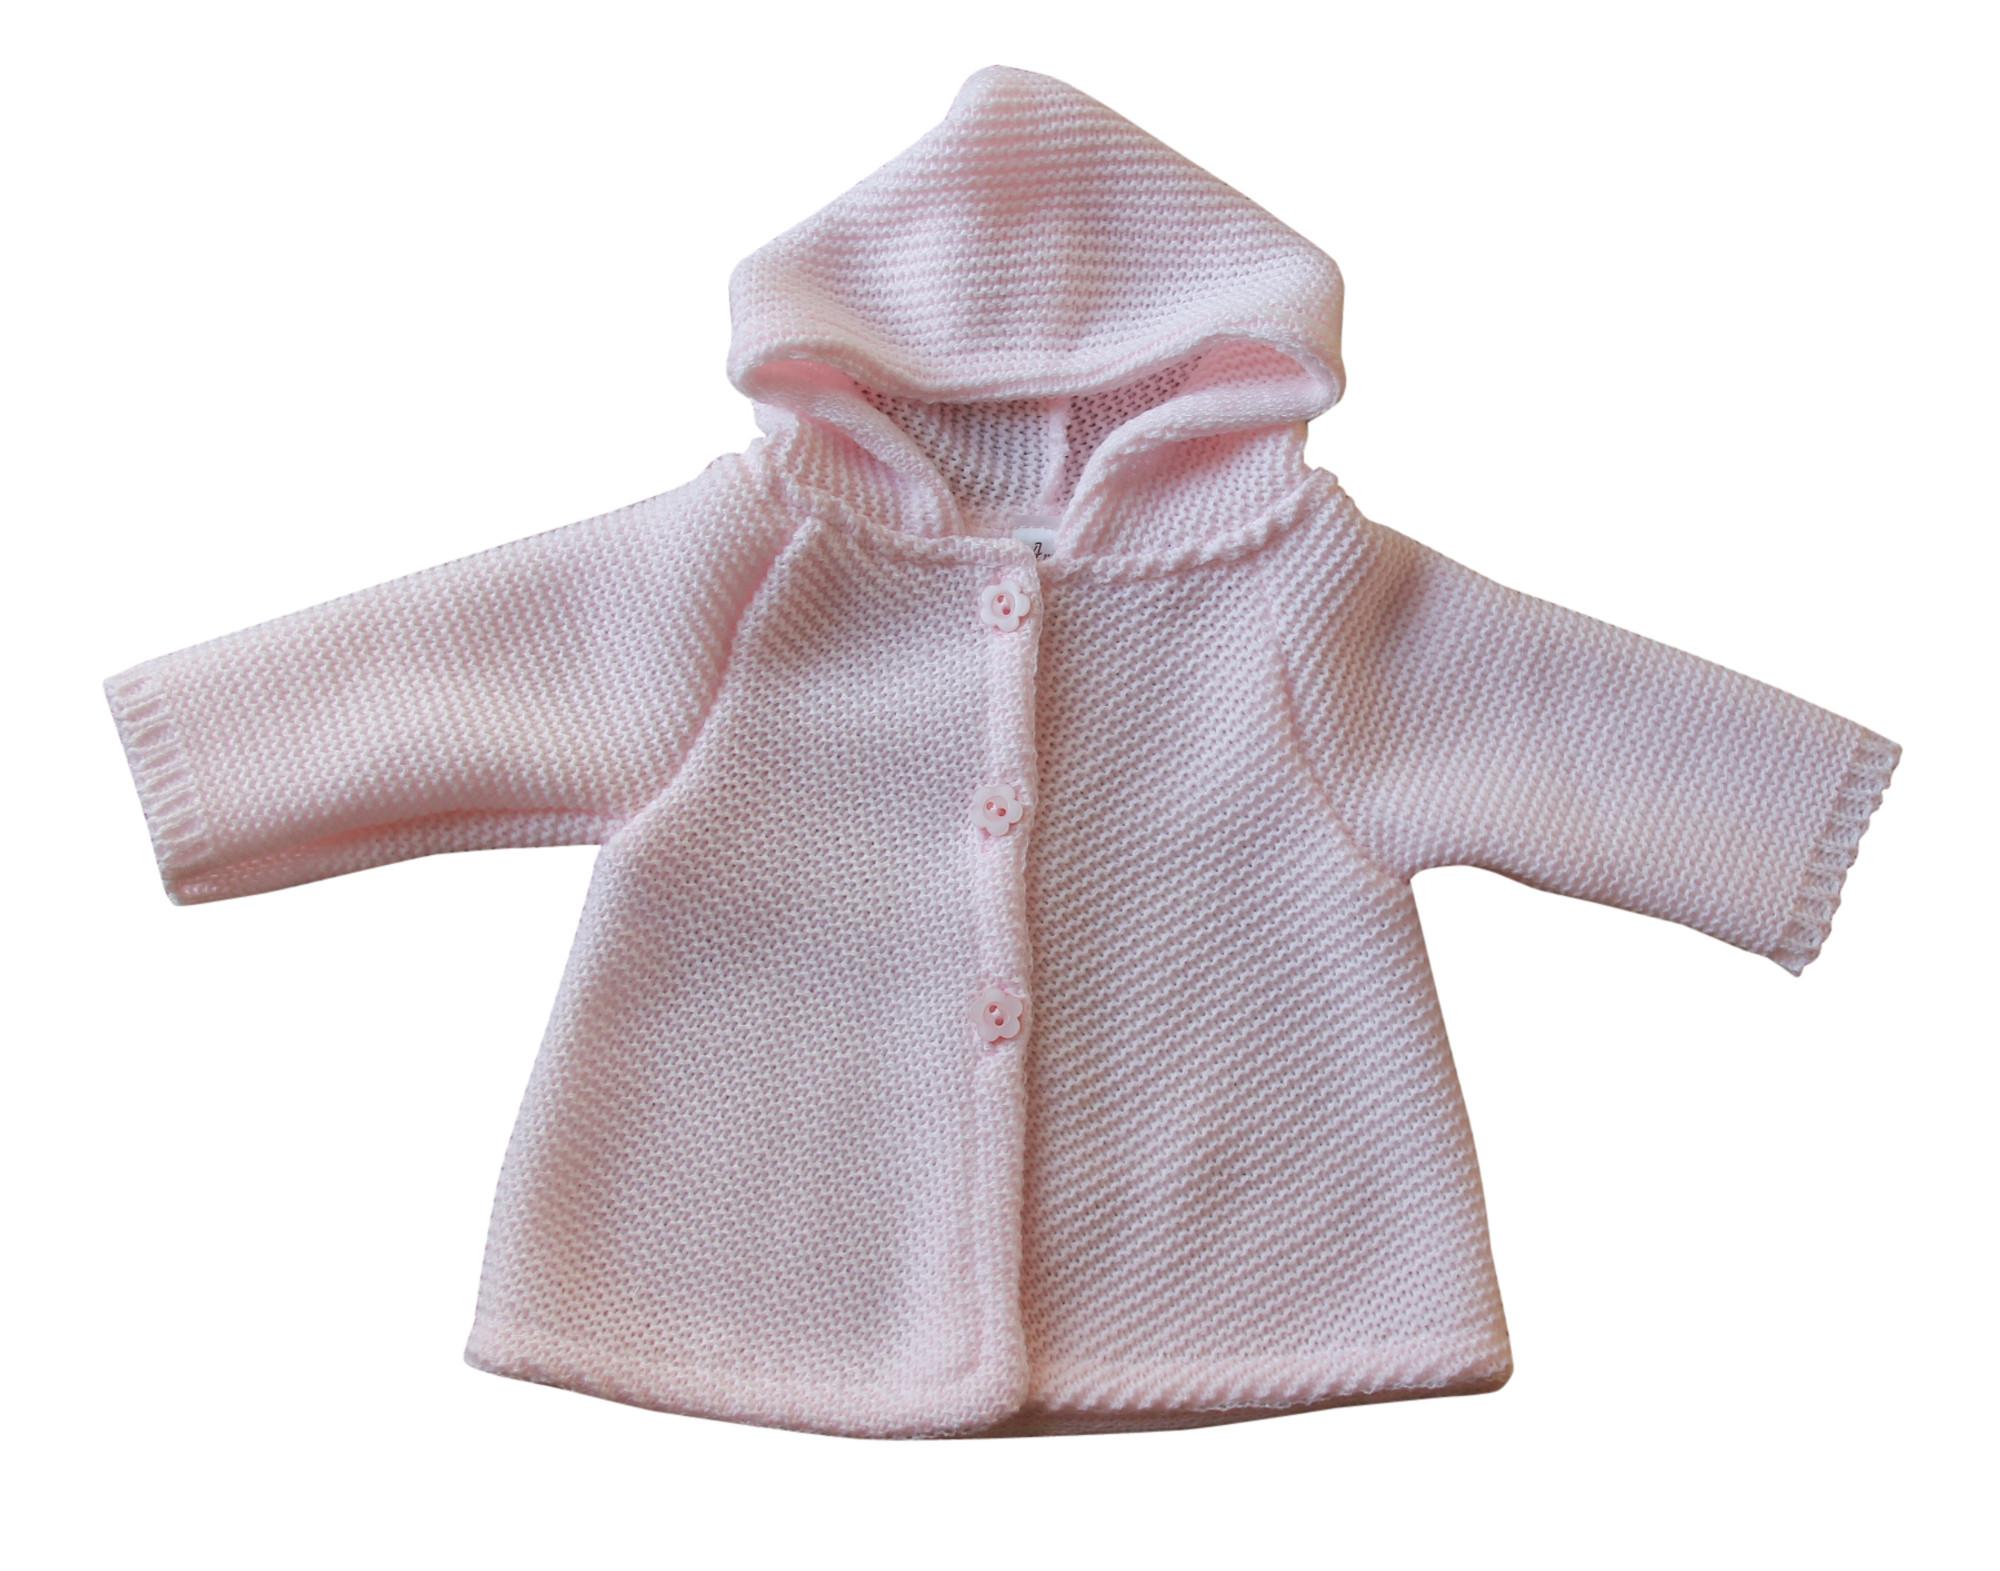 BIMARO Baby Mädchen Strickjacke mit Kapuze rosa langarm Taufjacke Bolero festlich Taufe Hochzeit Anlass 001